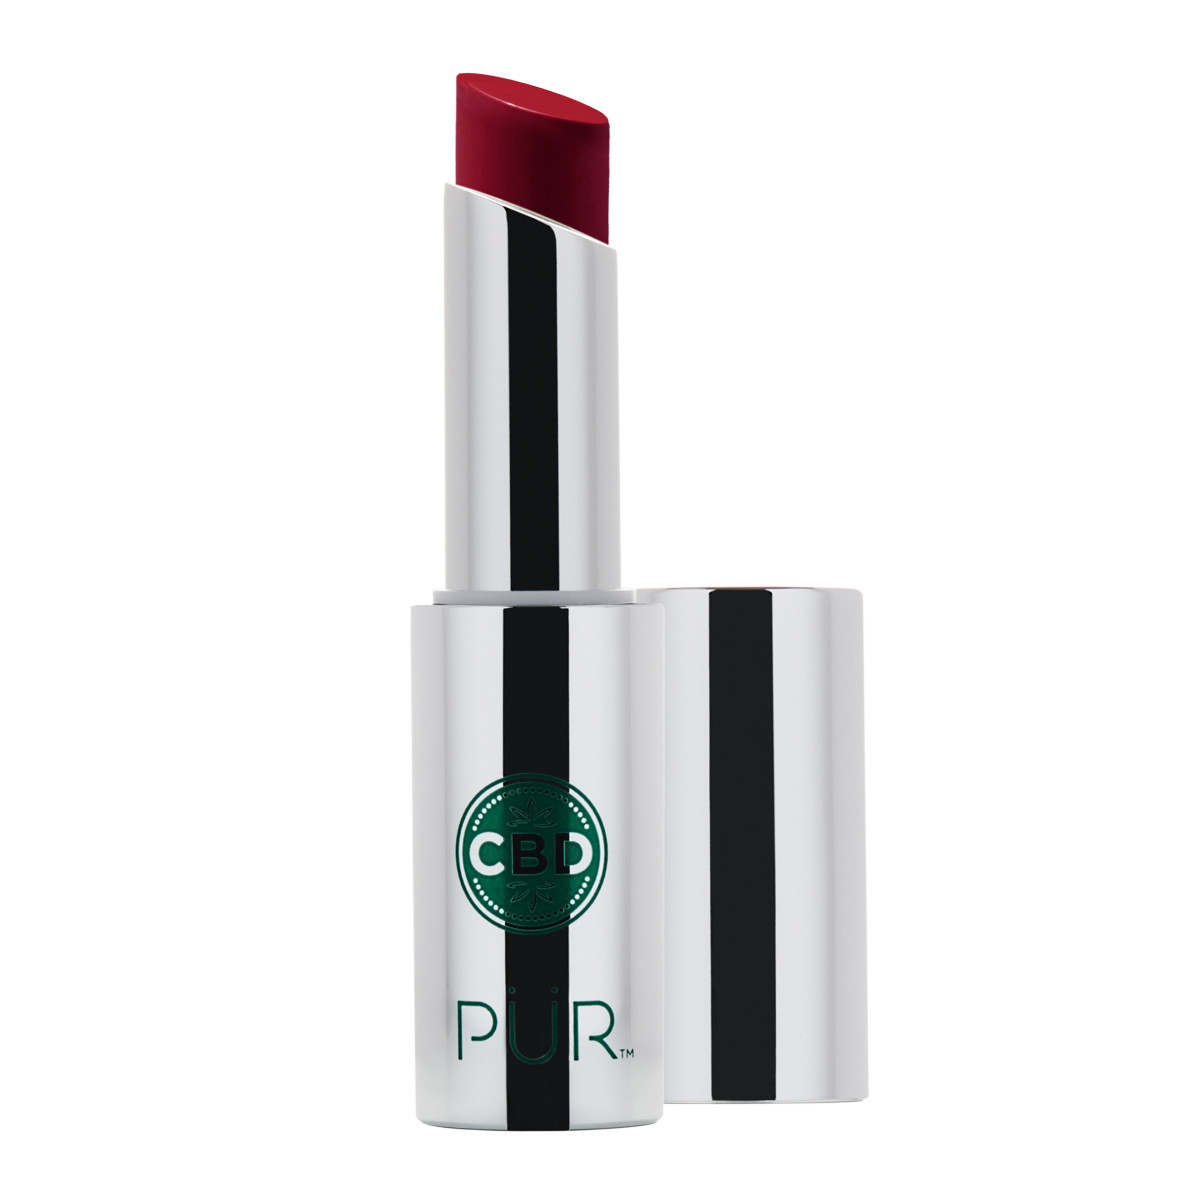 Hybrid Balm CBD Hydrating Tinted Lip and Cheek Balm in LMFAO (Berry)